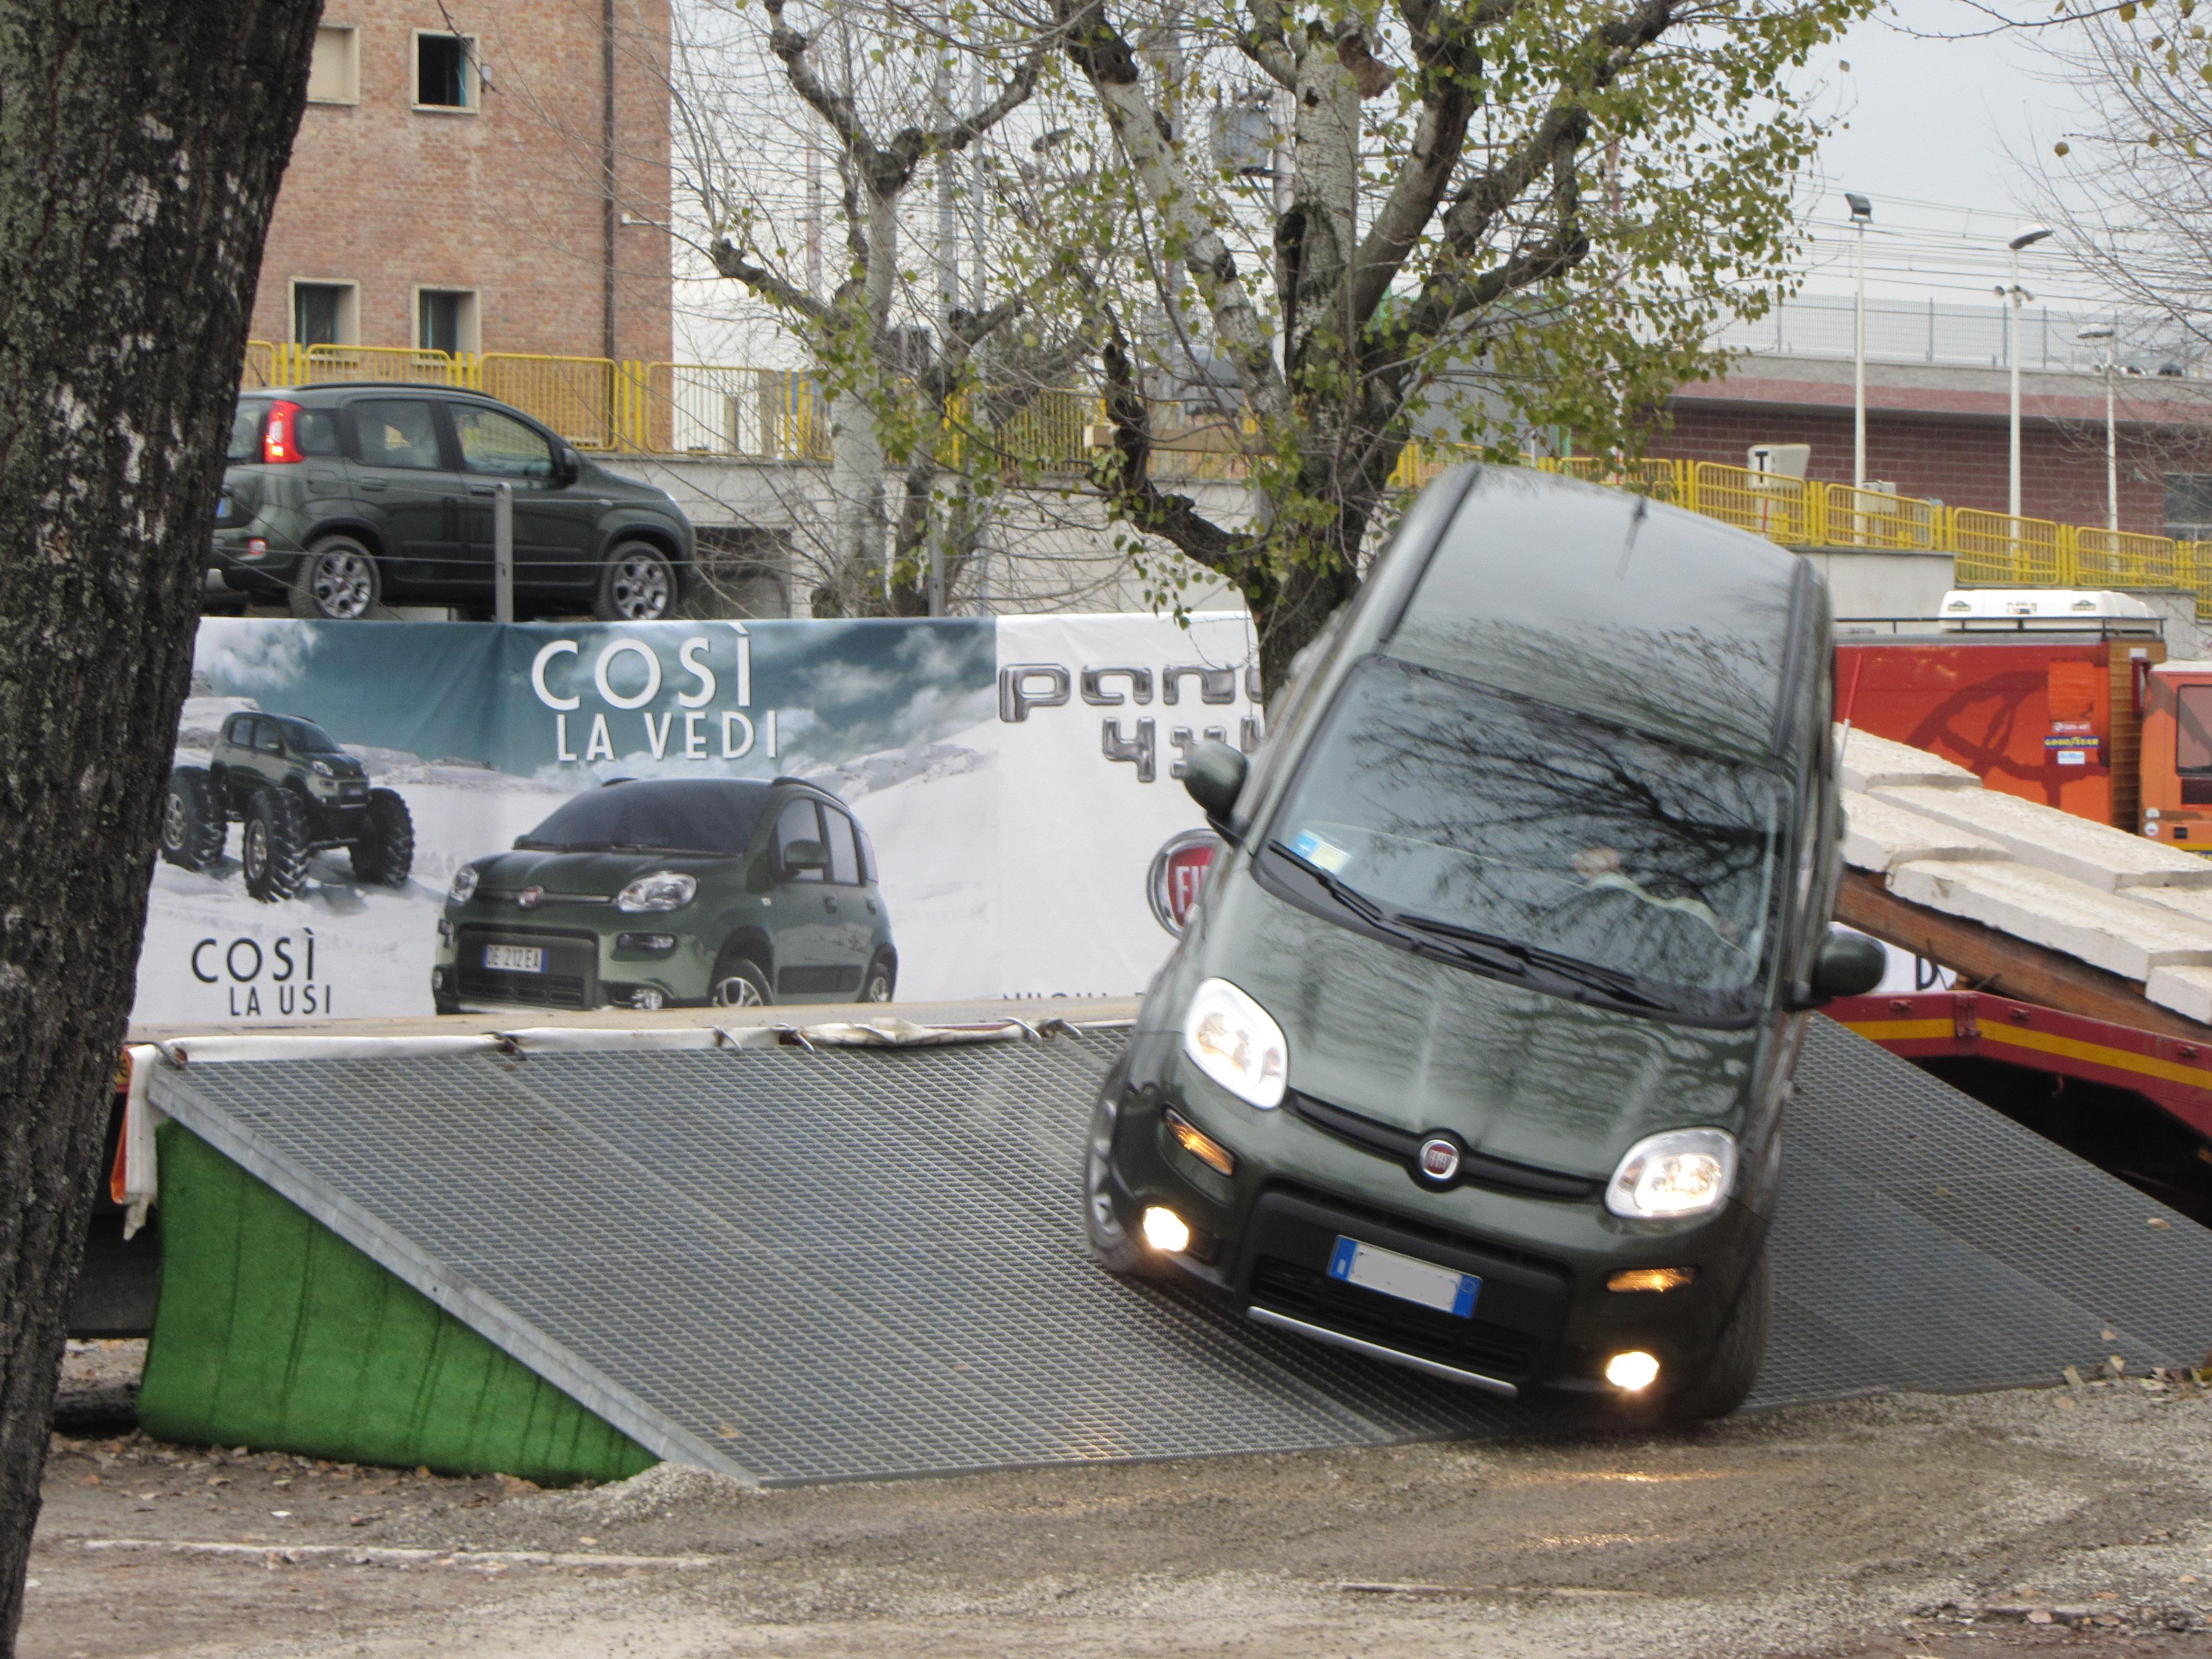 Ficheiro 12 Italy Fiat Panda 4x4 Test Drive Off Road At Bologna Motor Show 2012 09 Jpg Wikipedia A Enciclopedia Livre